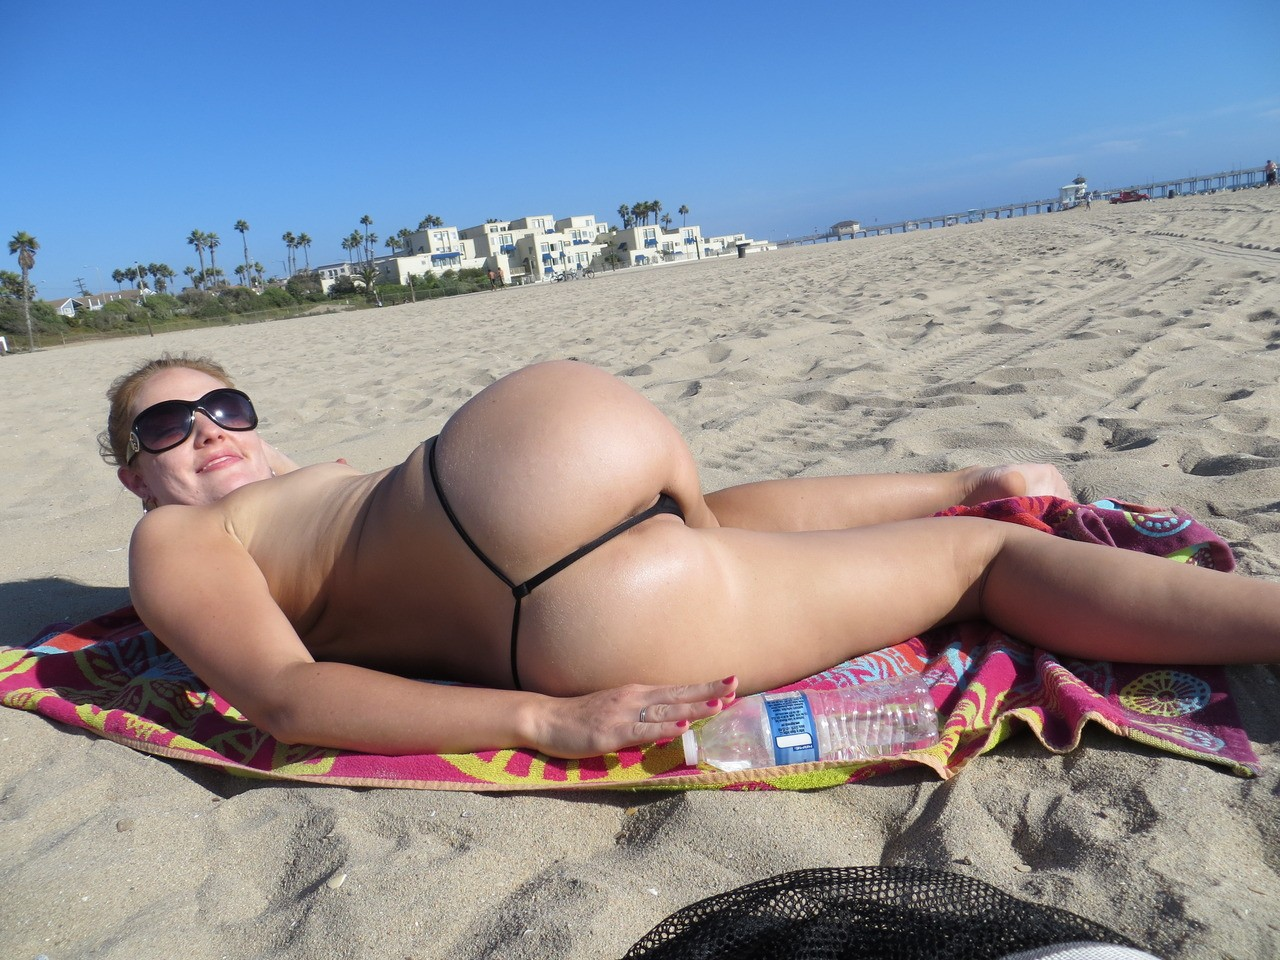 beeg plumber hot porn watch and download beeg plumber #Amateur #beach #topless #bikini #thong #pawg #smiling #blonde #ass #pawg